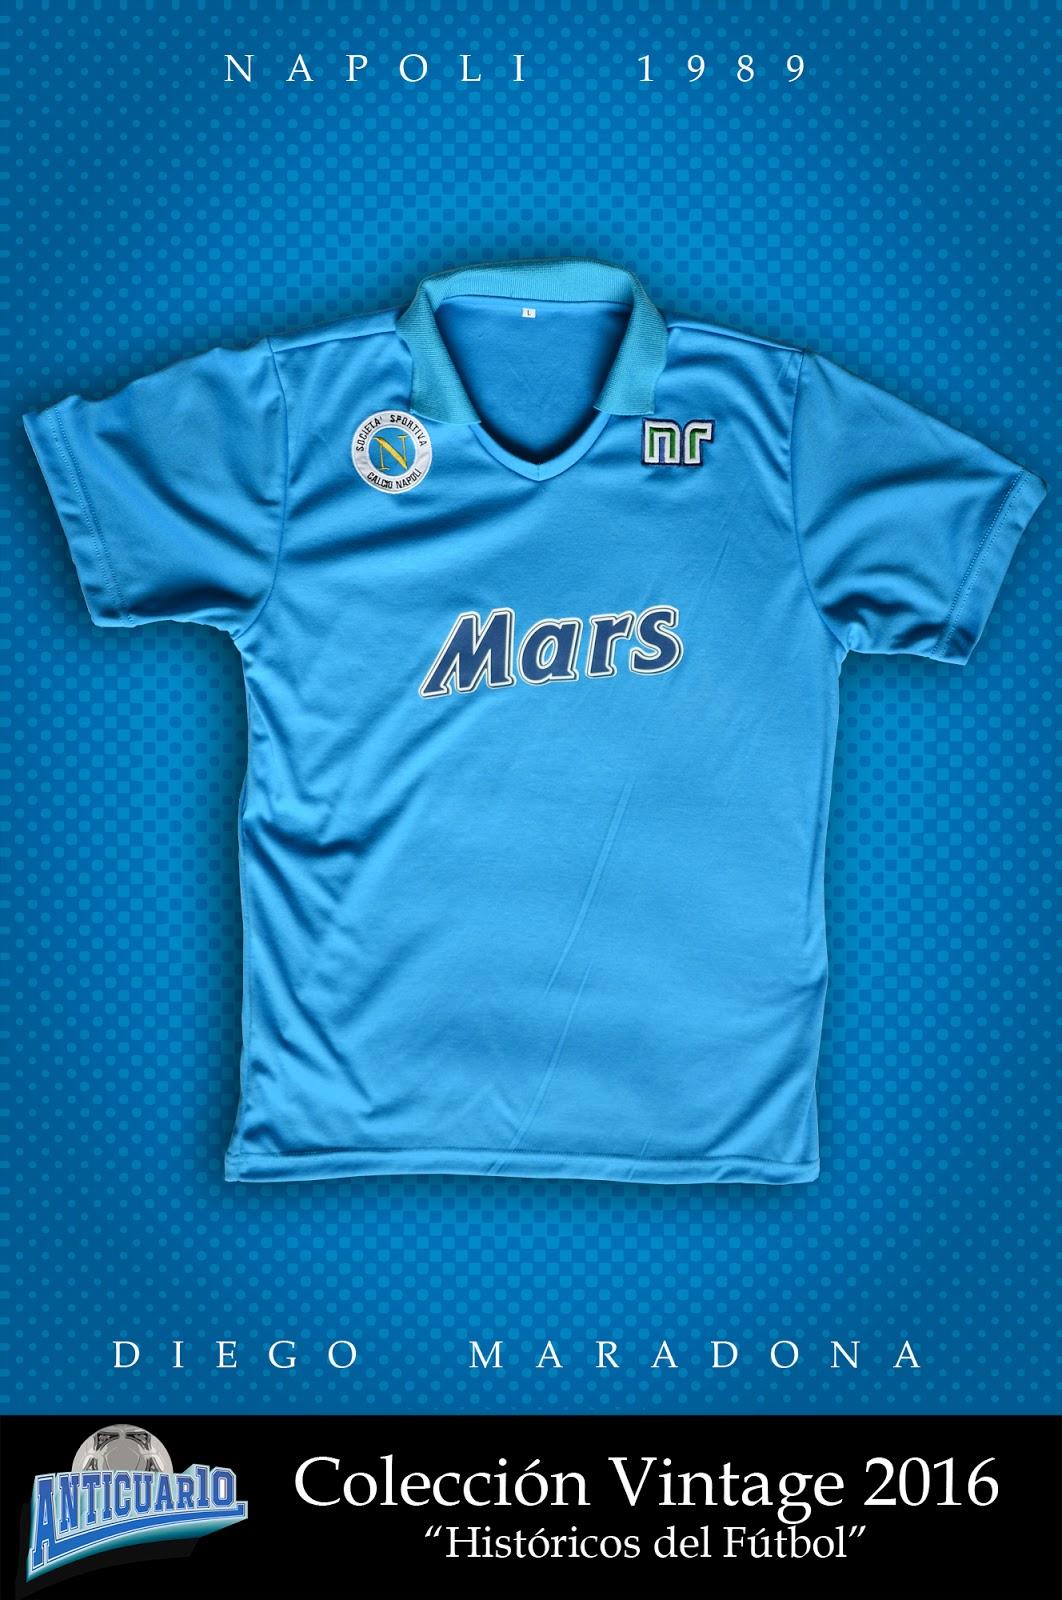 50ca05e0e6fab Anticuar10  Camiseta RETRO Diego Maradona - Napoli 1989 ( 70.000)